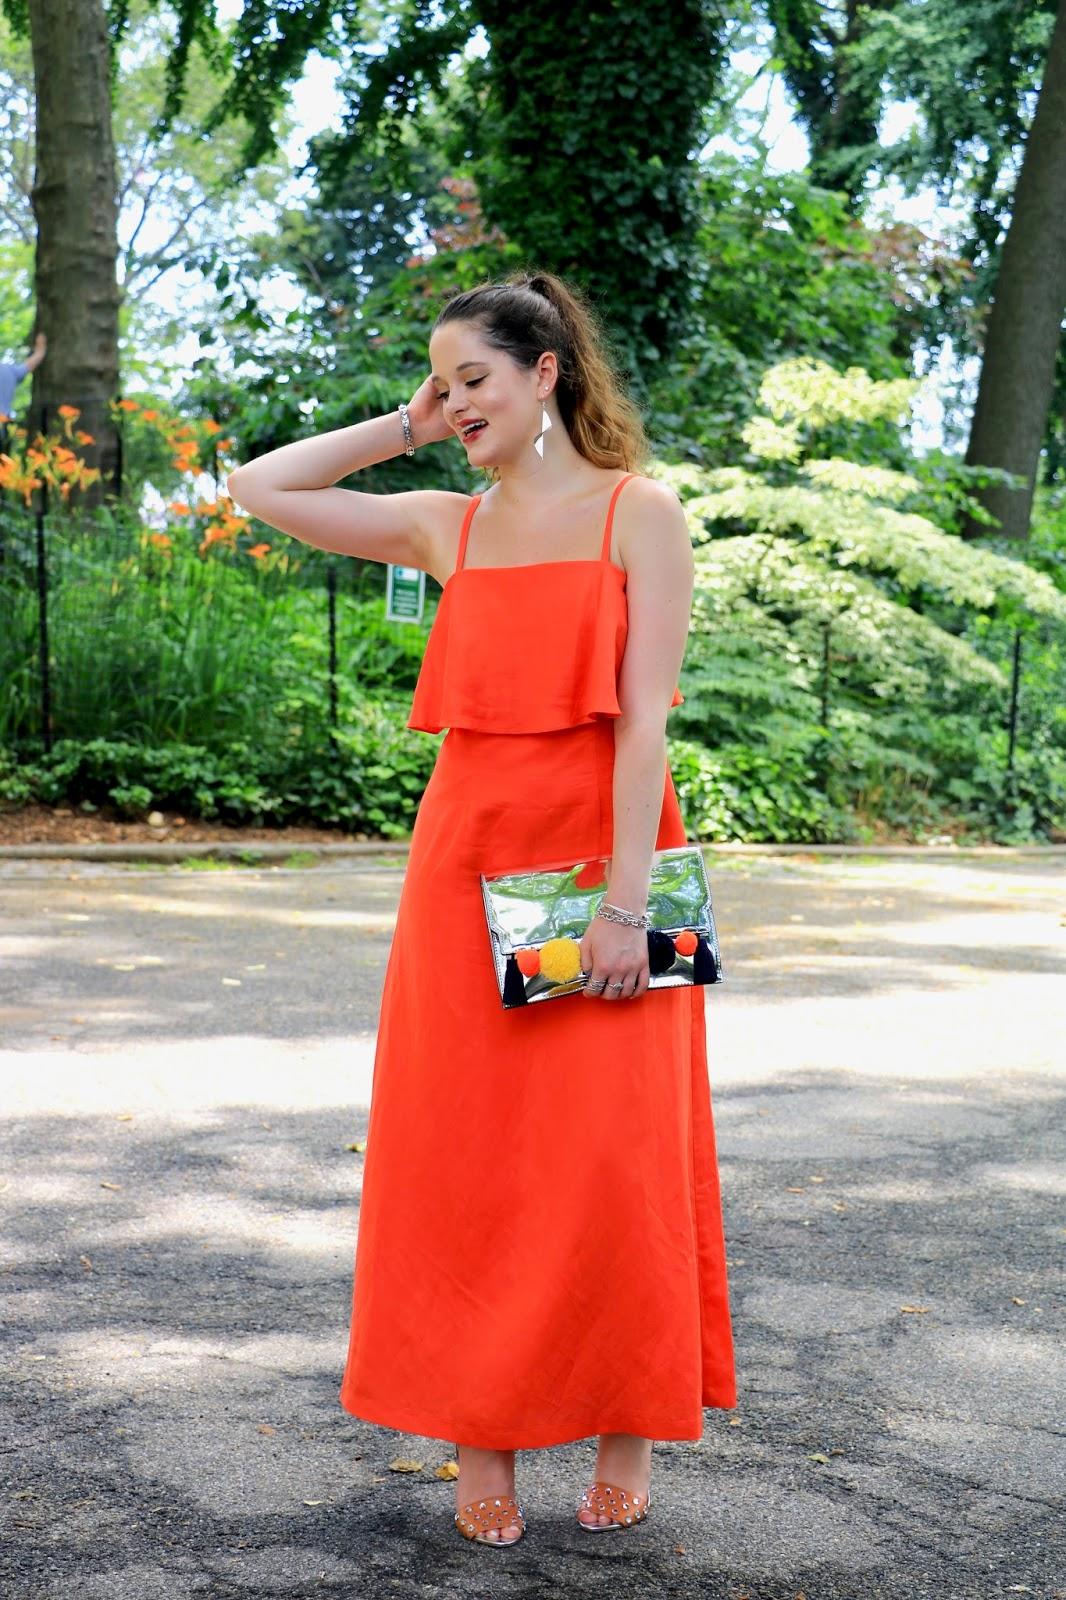 Fashion blogger Kathleen Harper of Kat's Fashion Fix showing how to wear orange maxi dress